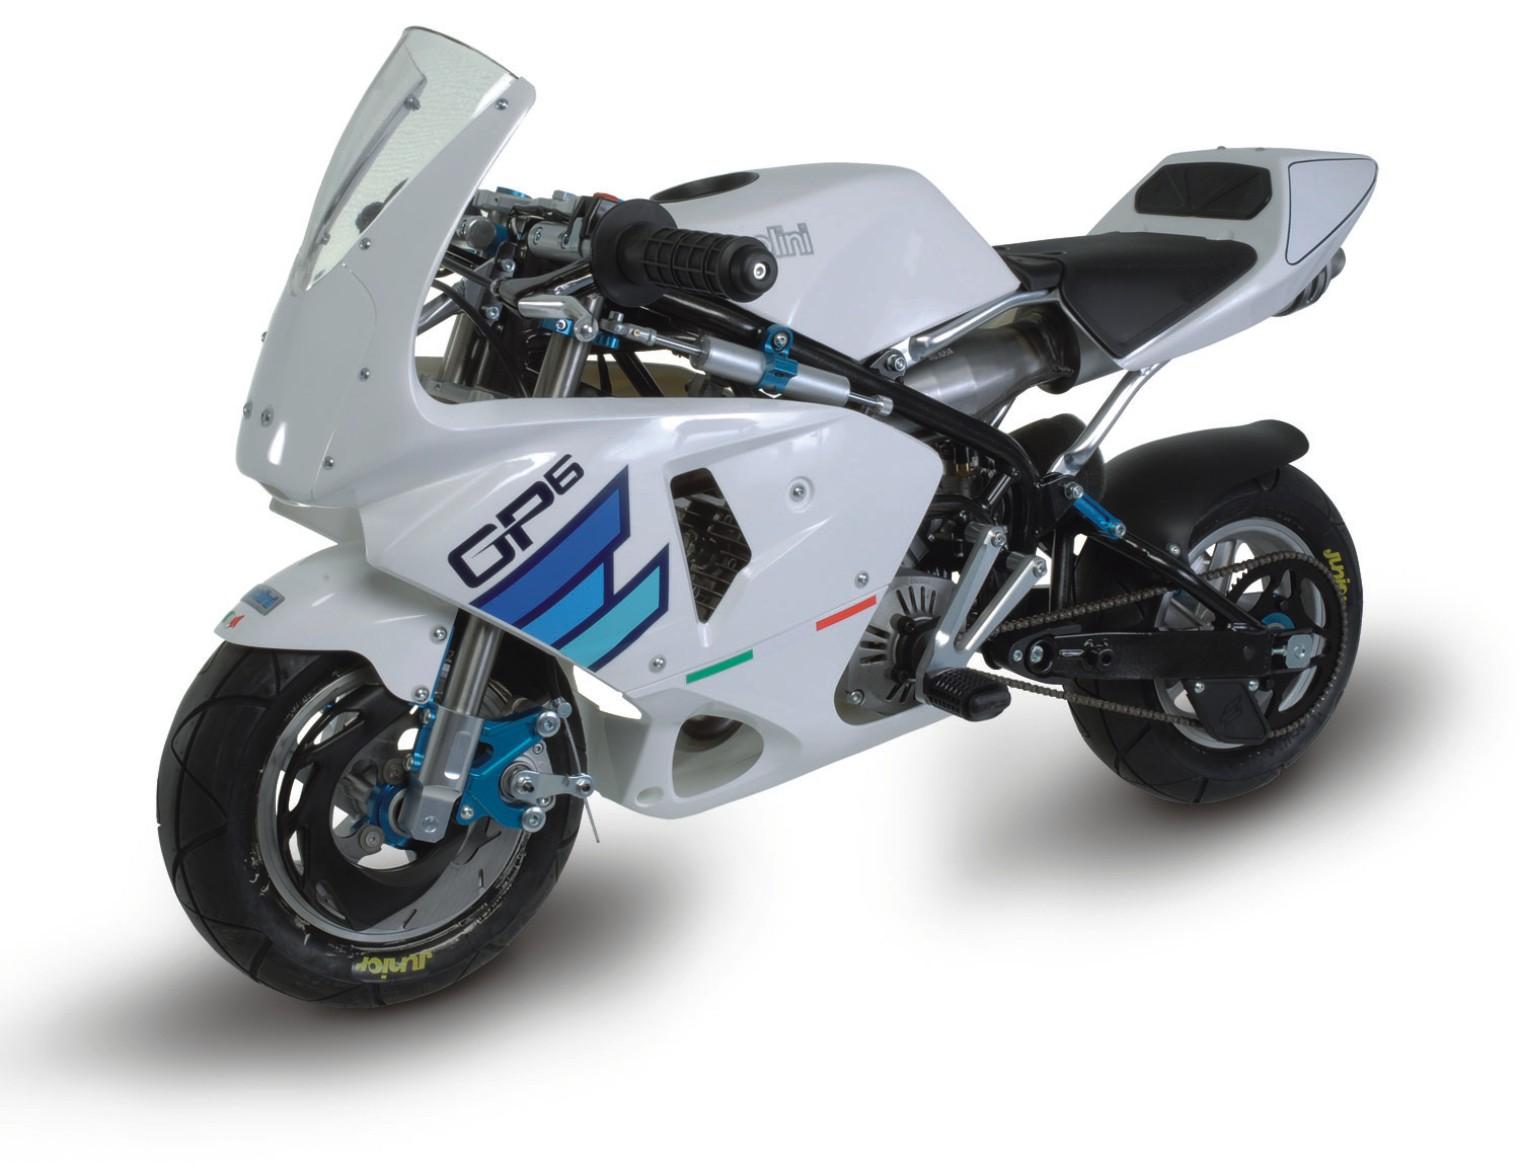 Polini 911 GP6 for Race. € 2.090,-